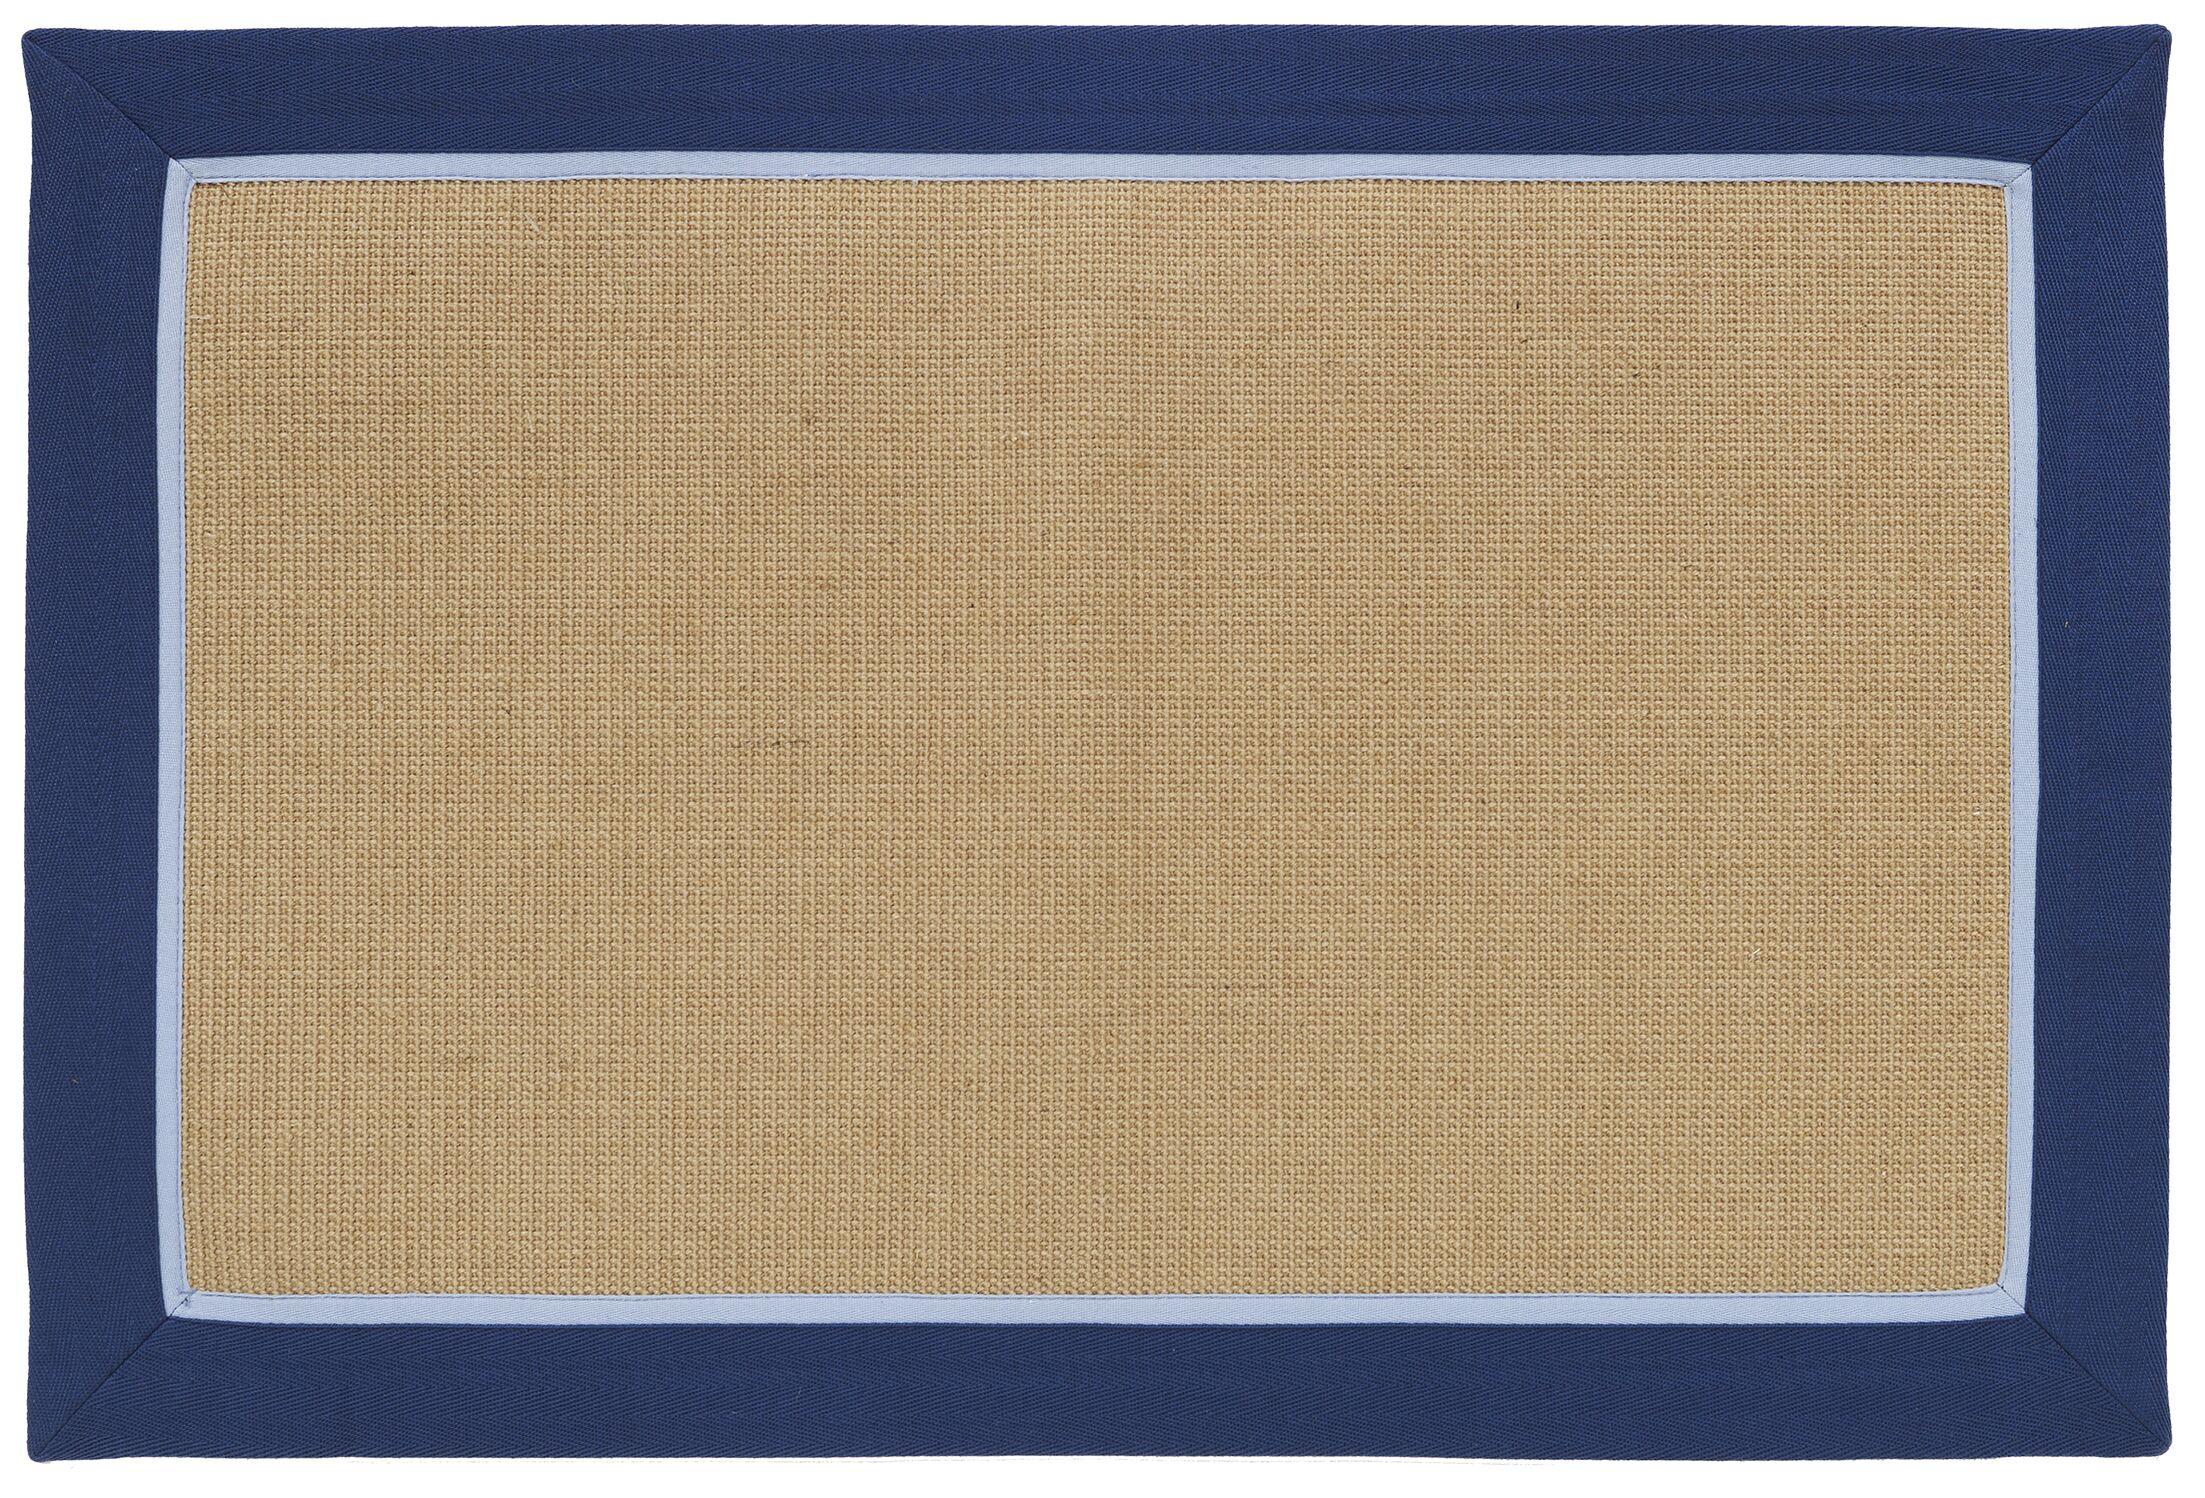 York Kitchen Mat Mat Size: Rectangle 4' x 6', Color: Silver Gray